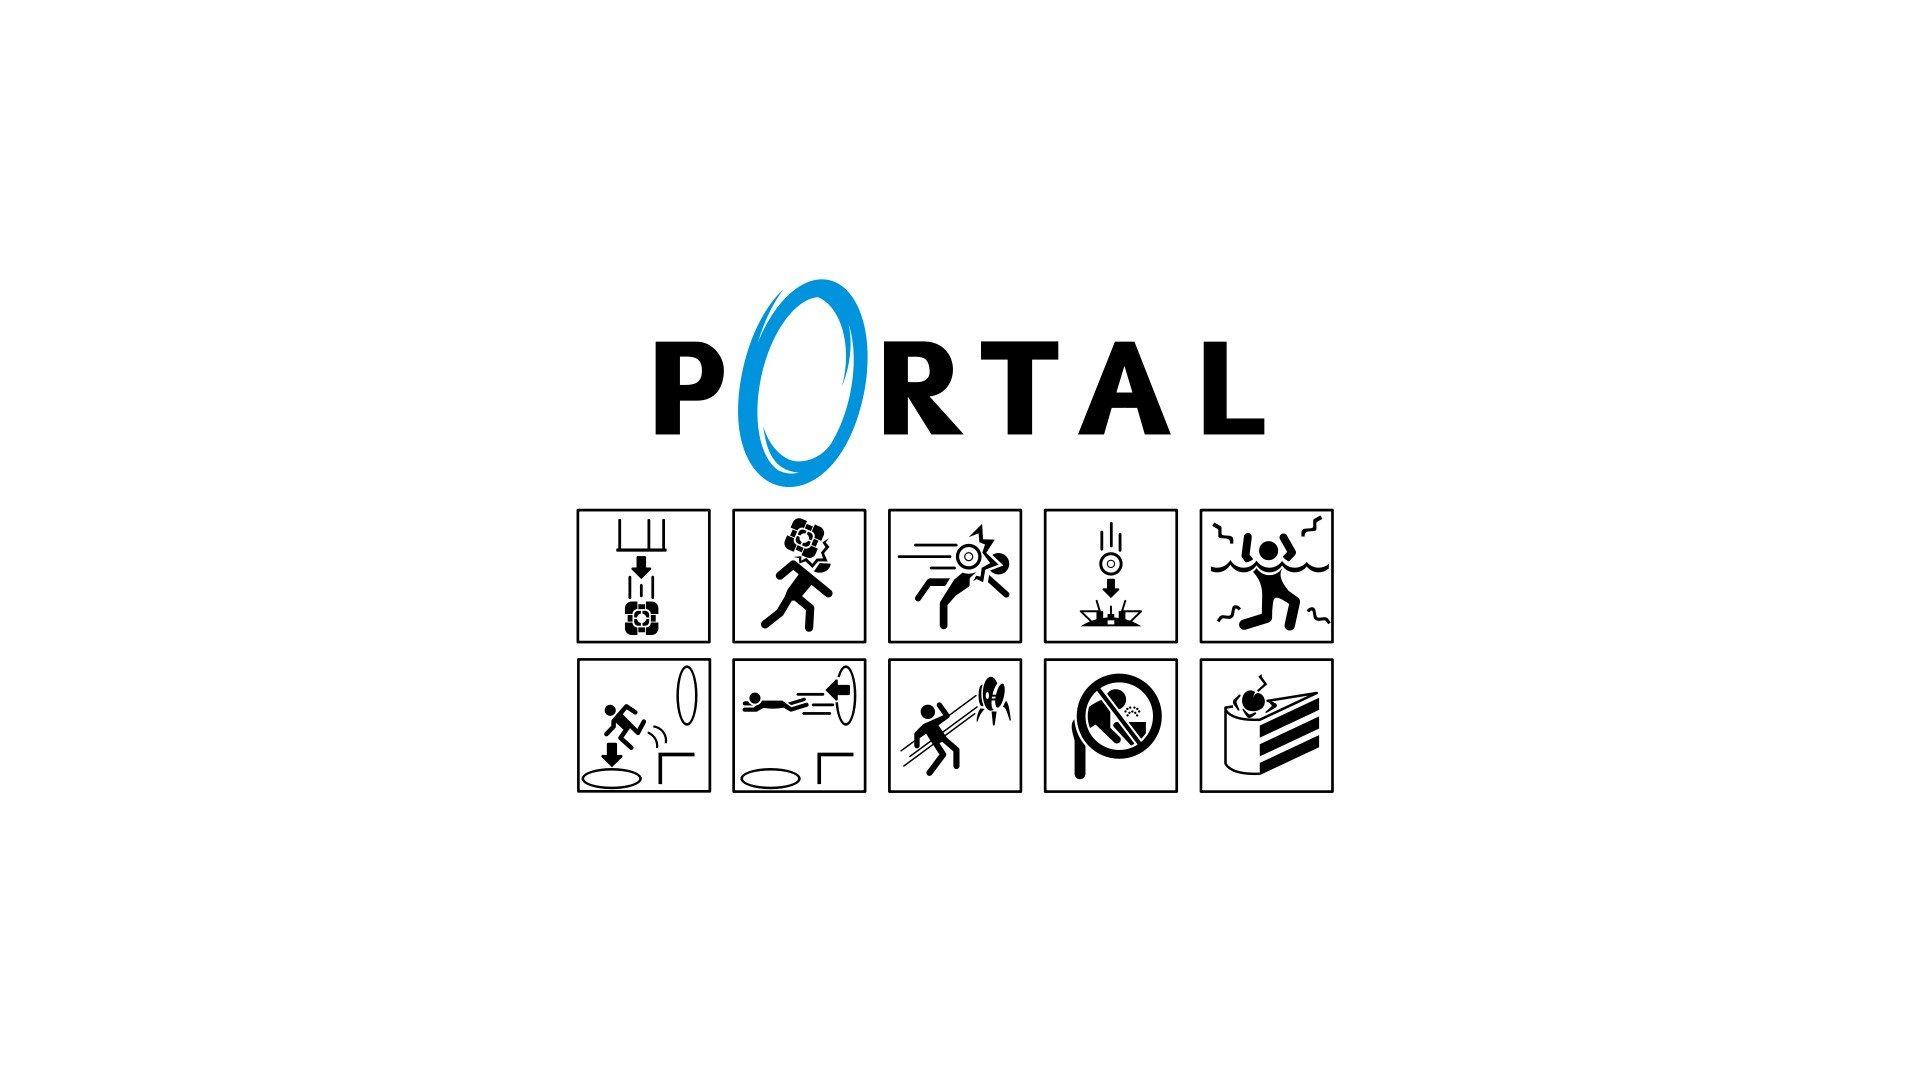 Portal Game Video Games Wallpapers Hd Desktop And